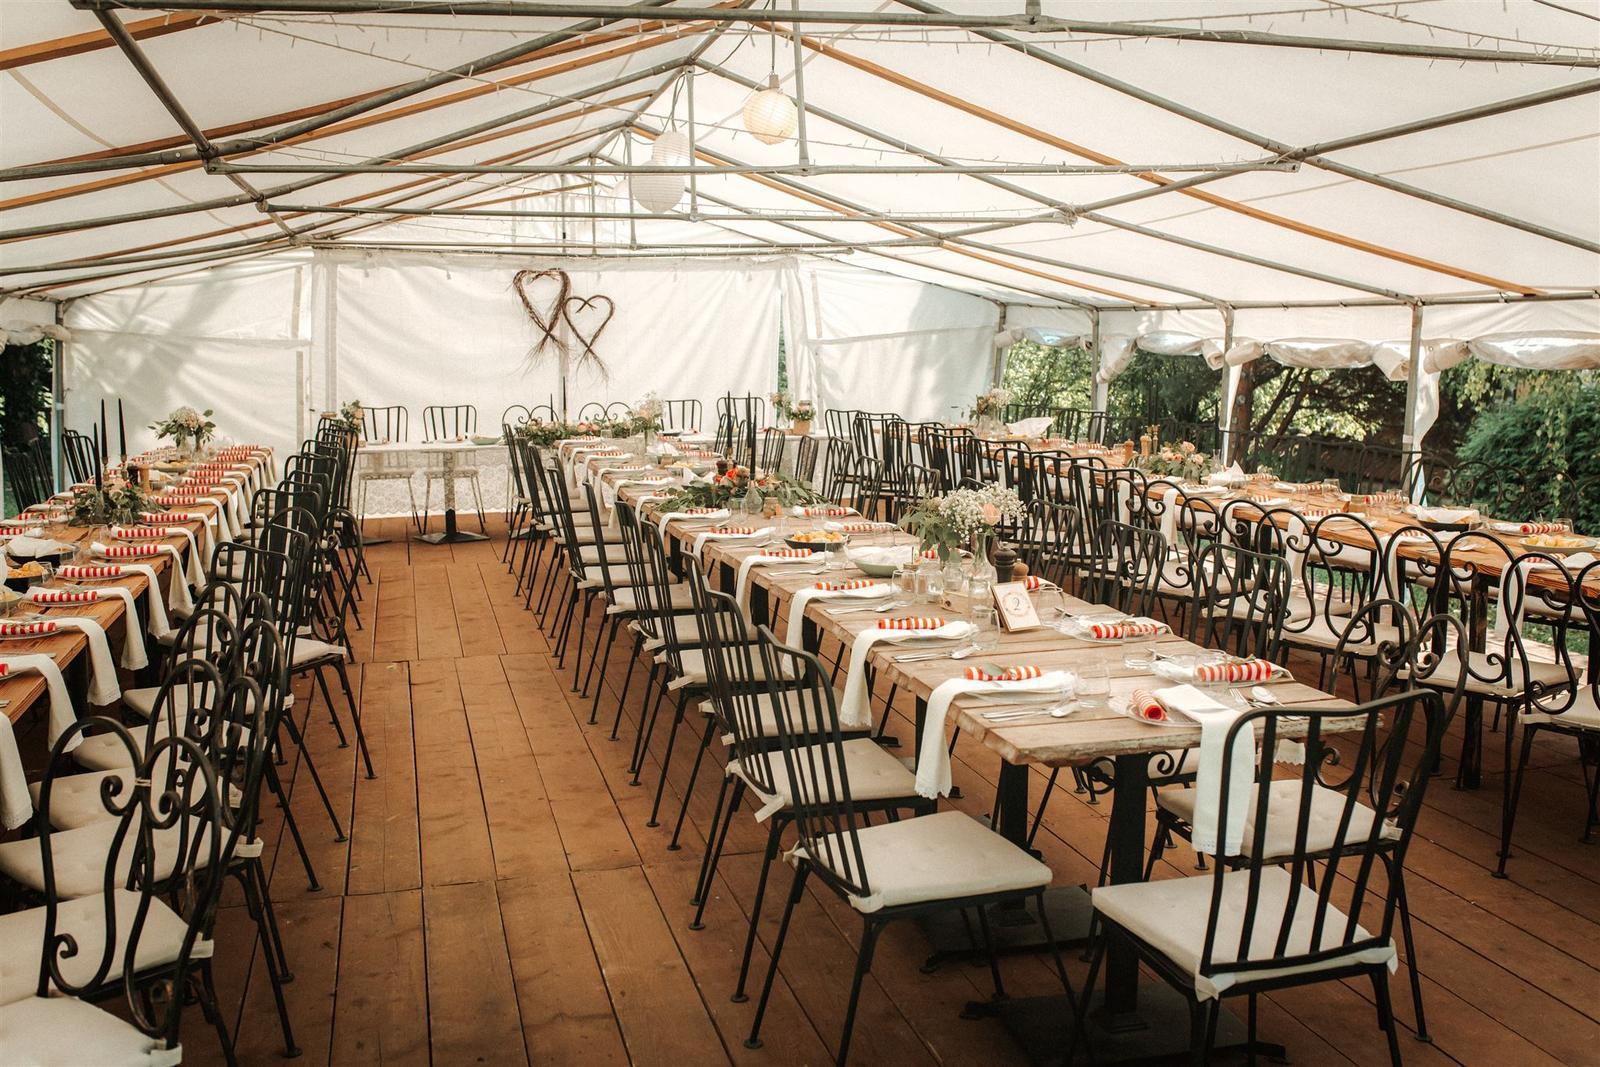 Krásna a romantická svadobná party v záhrade reštaurácie Bistra Dukát - Le Gout v srdci B. Bystrice. - Obrázok č. 1